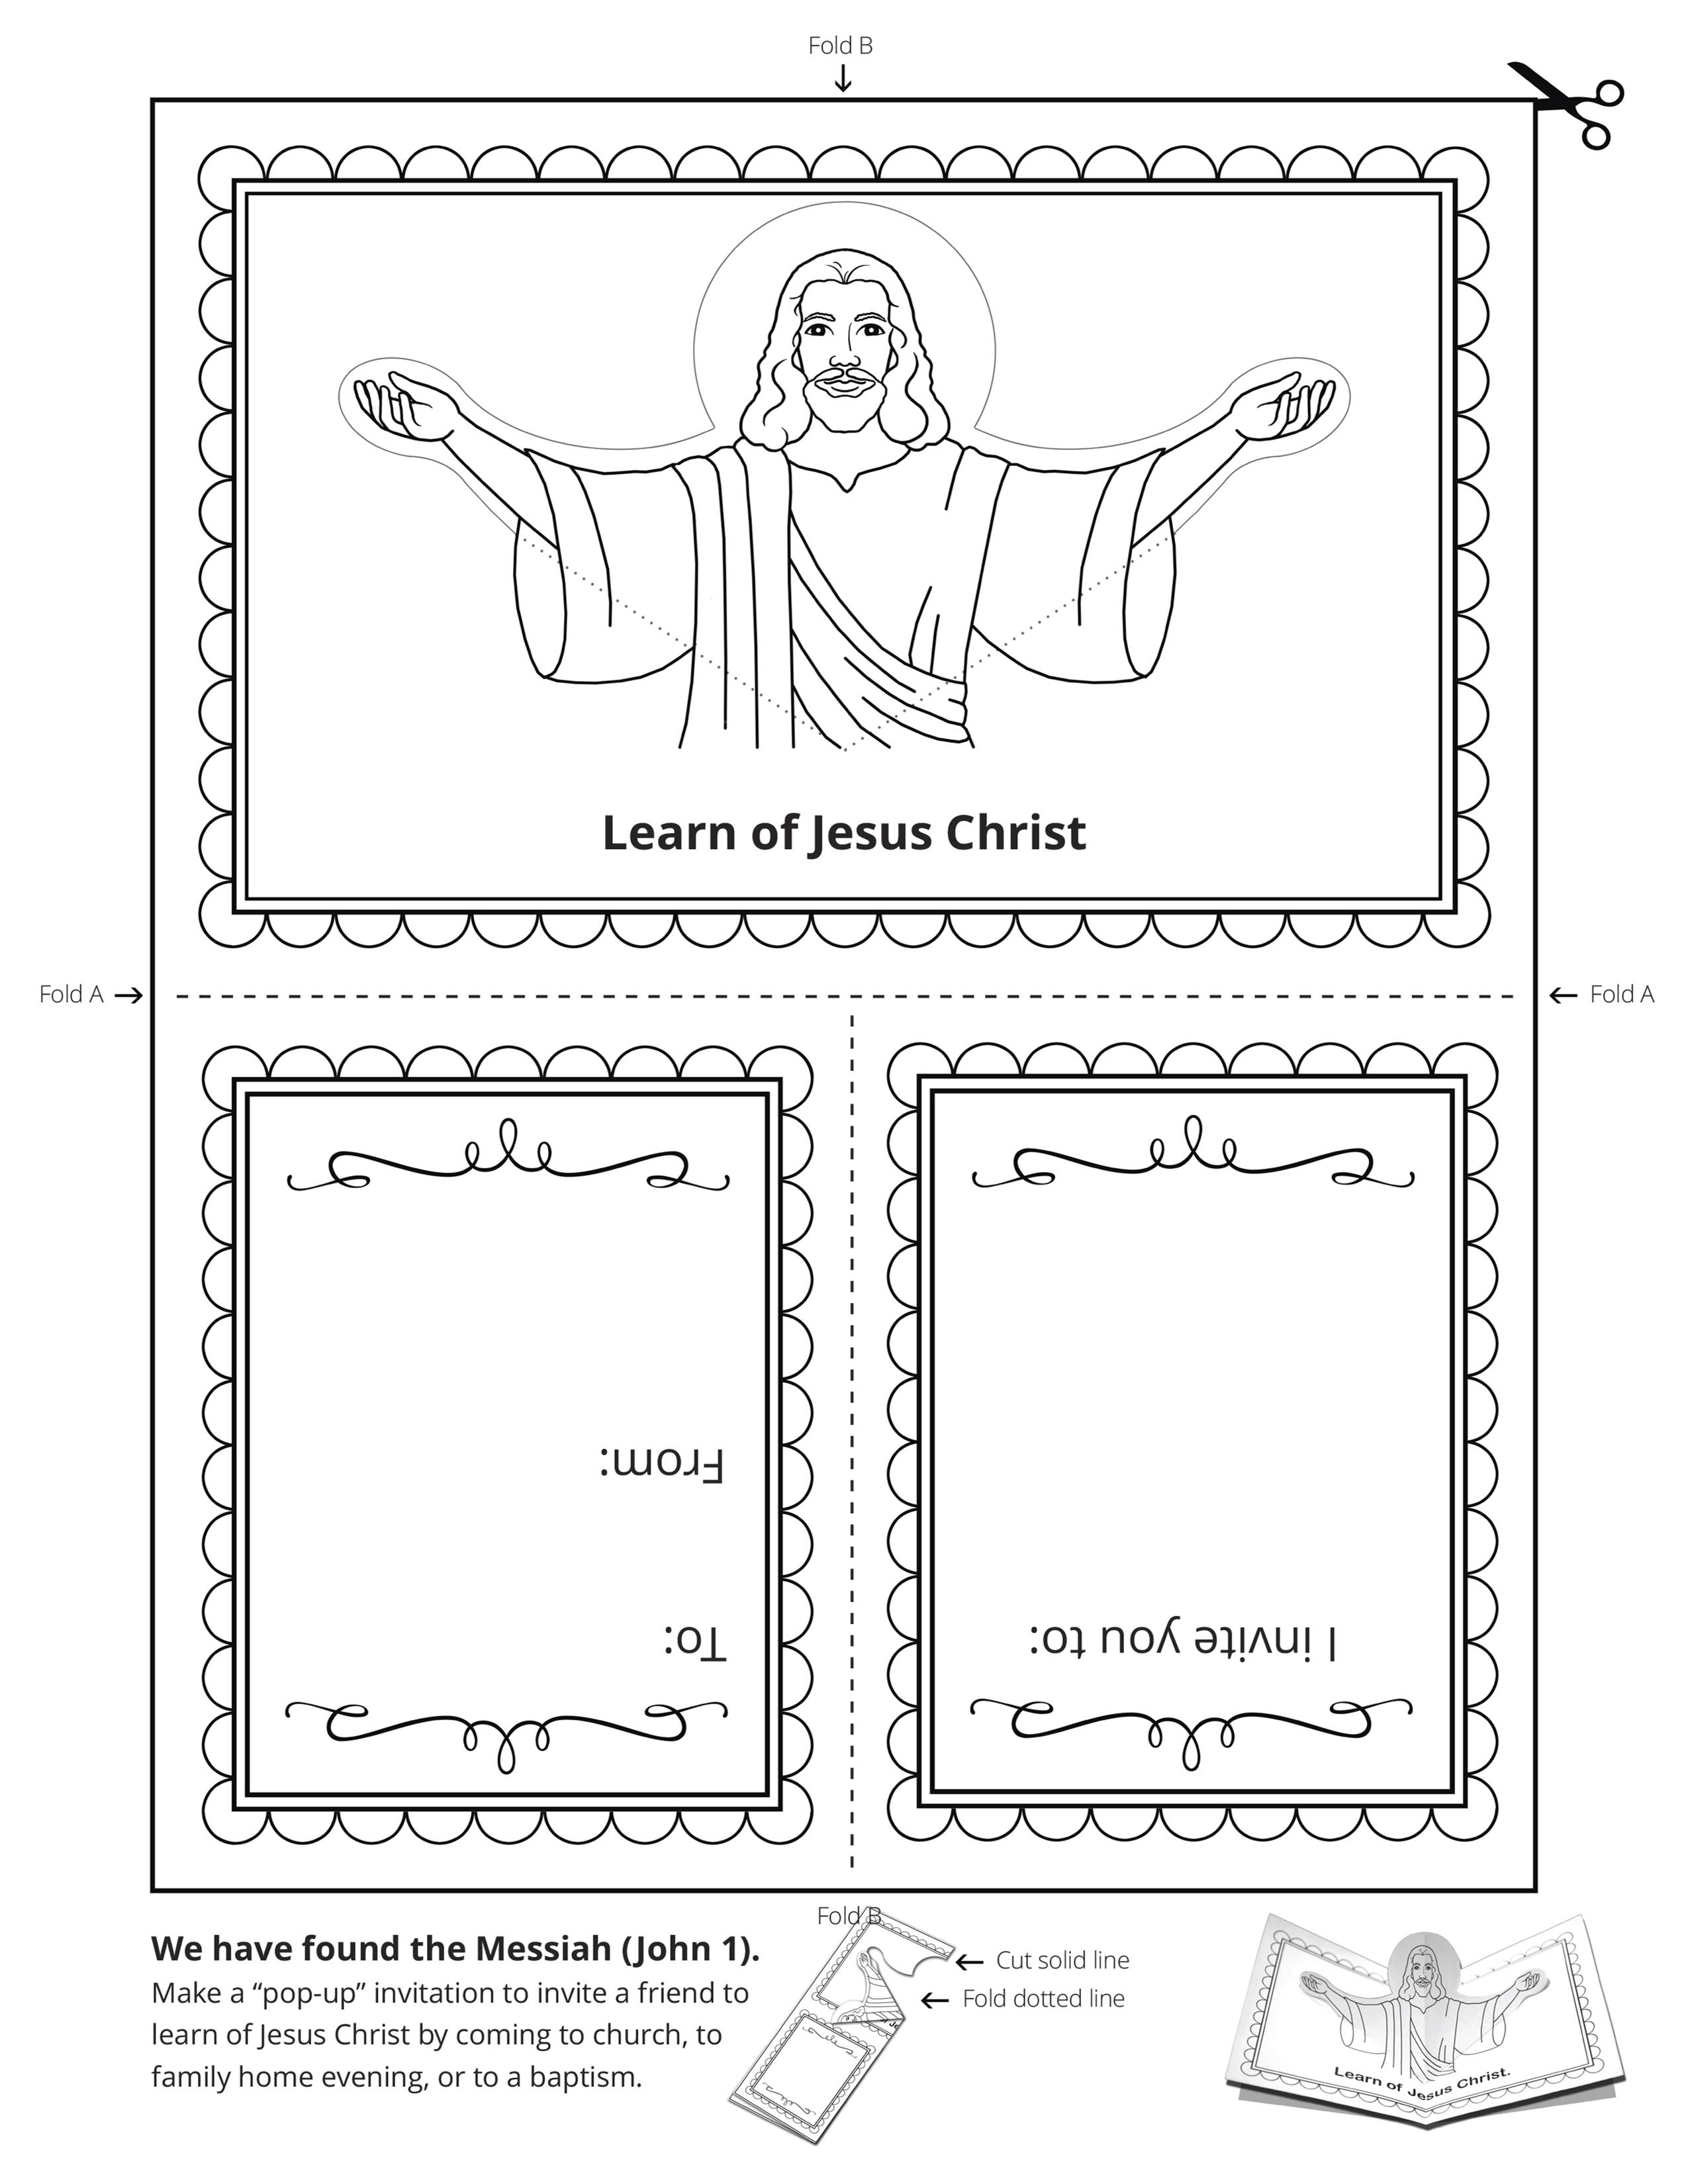 An illustration of Christ.